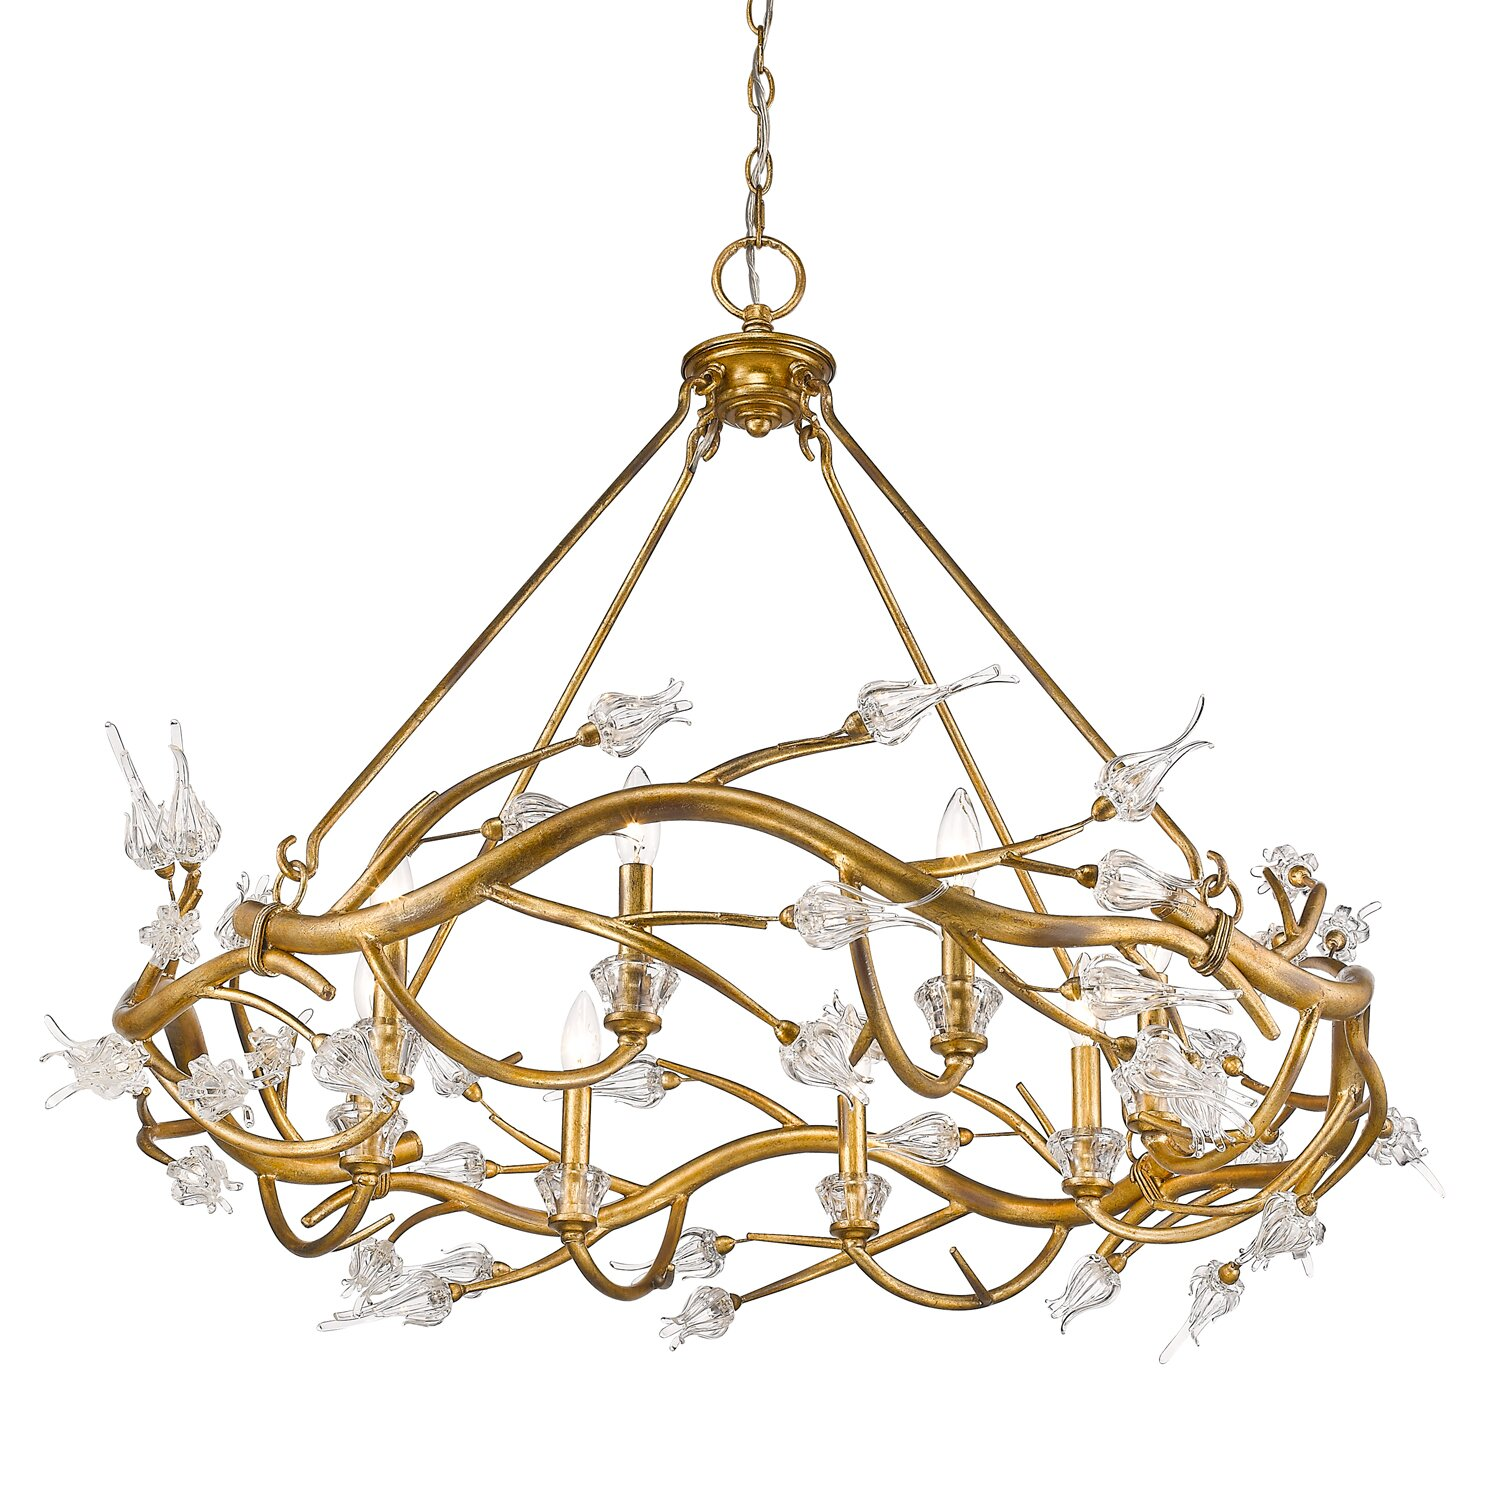 House of hampton rosmeer 6 light crystal chandelier for 6 light crystal chandelier